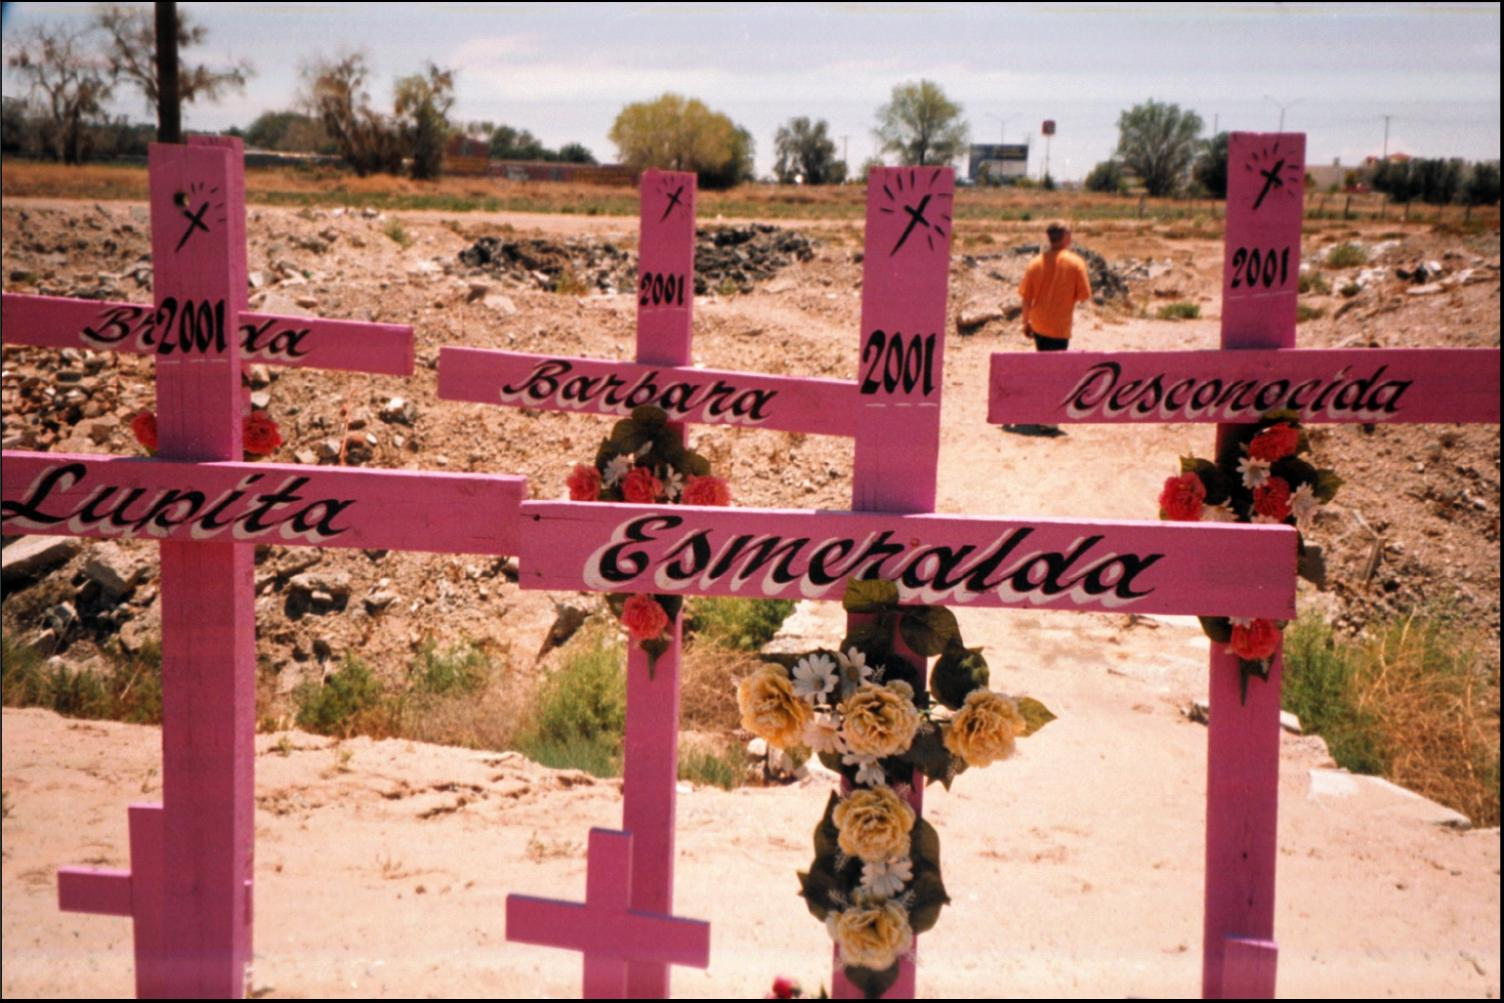 feminicide in the novel if i die in juarez by stella pope duarte